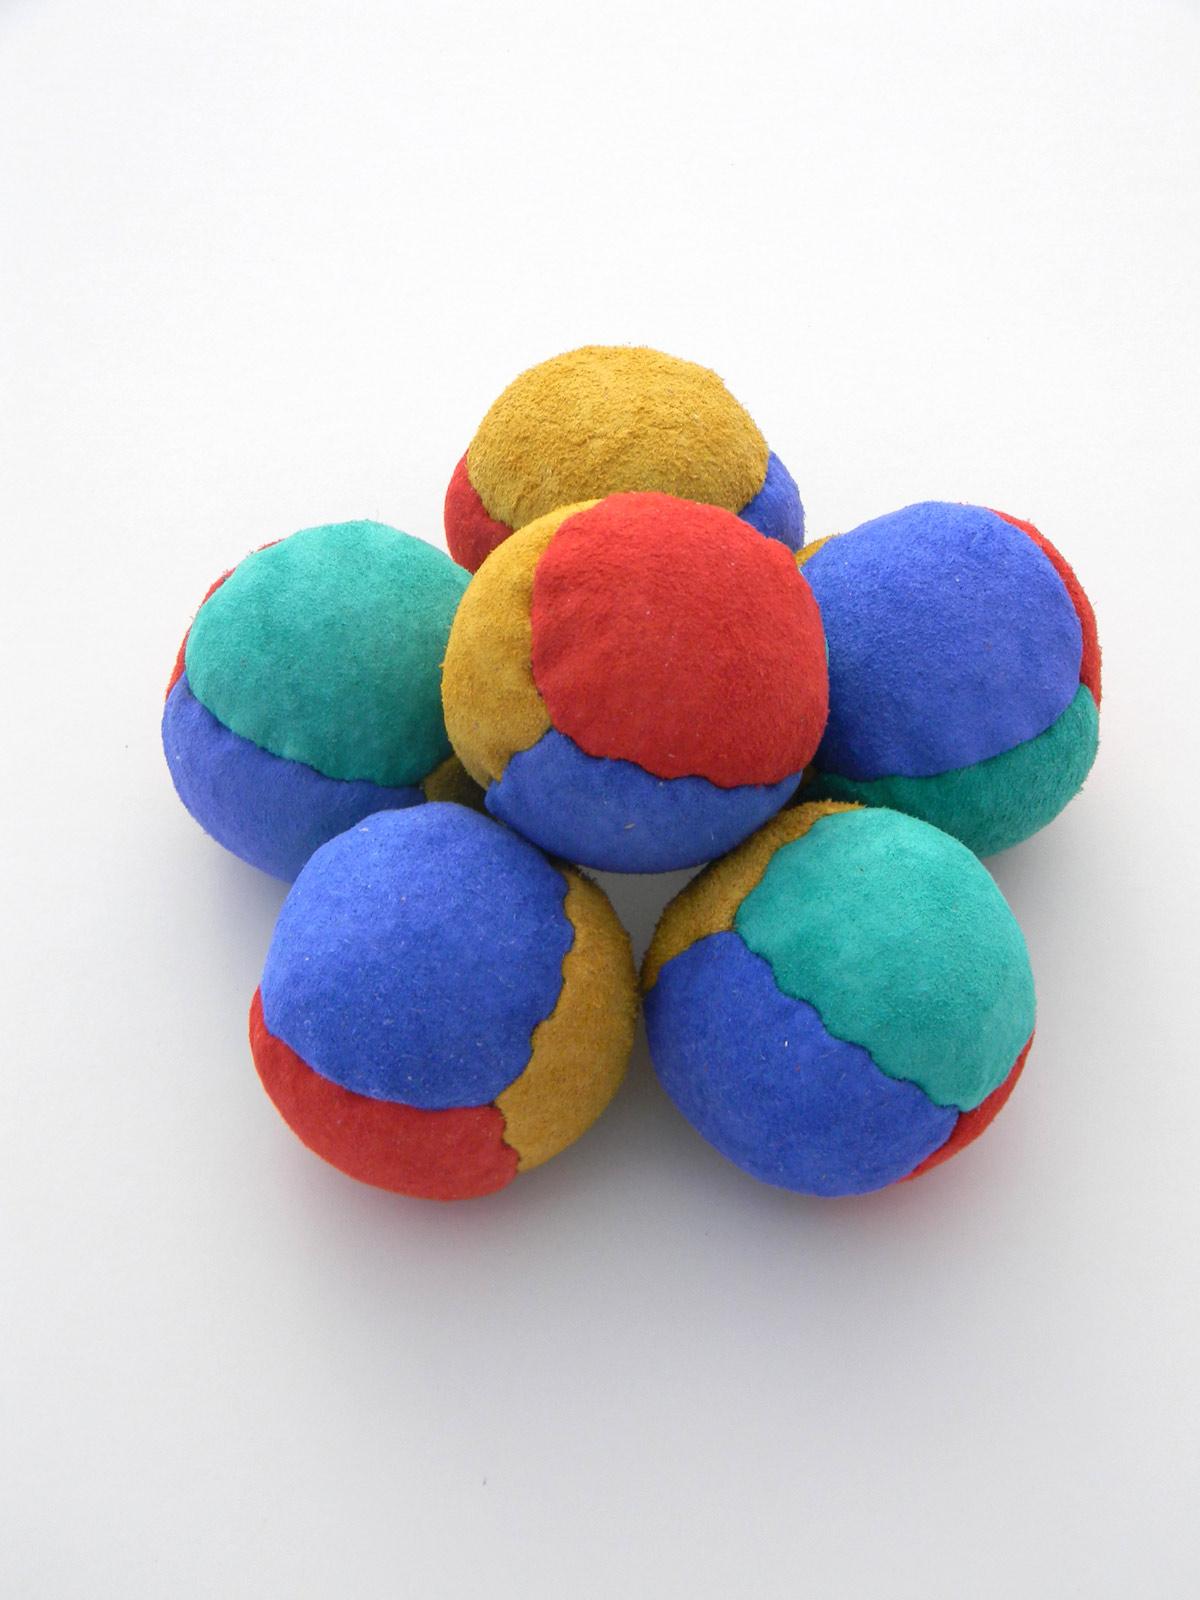 Bag Of Different Balls